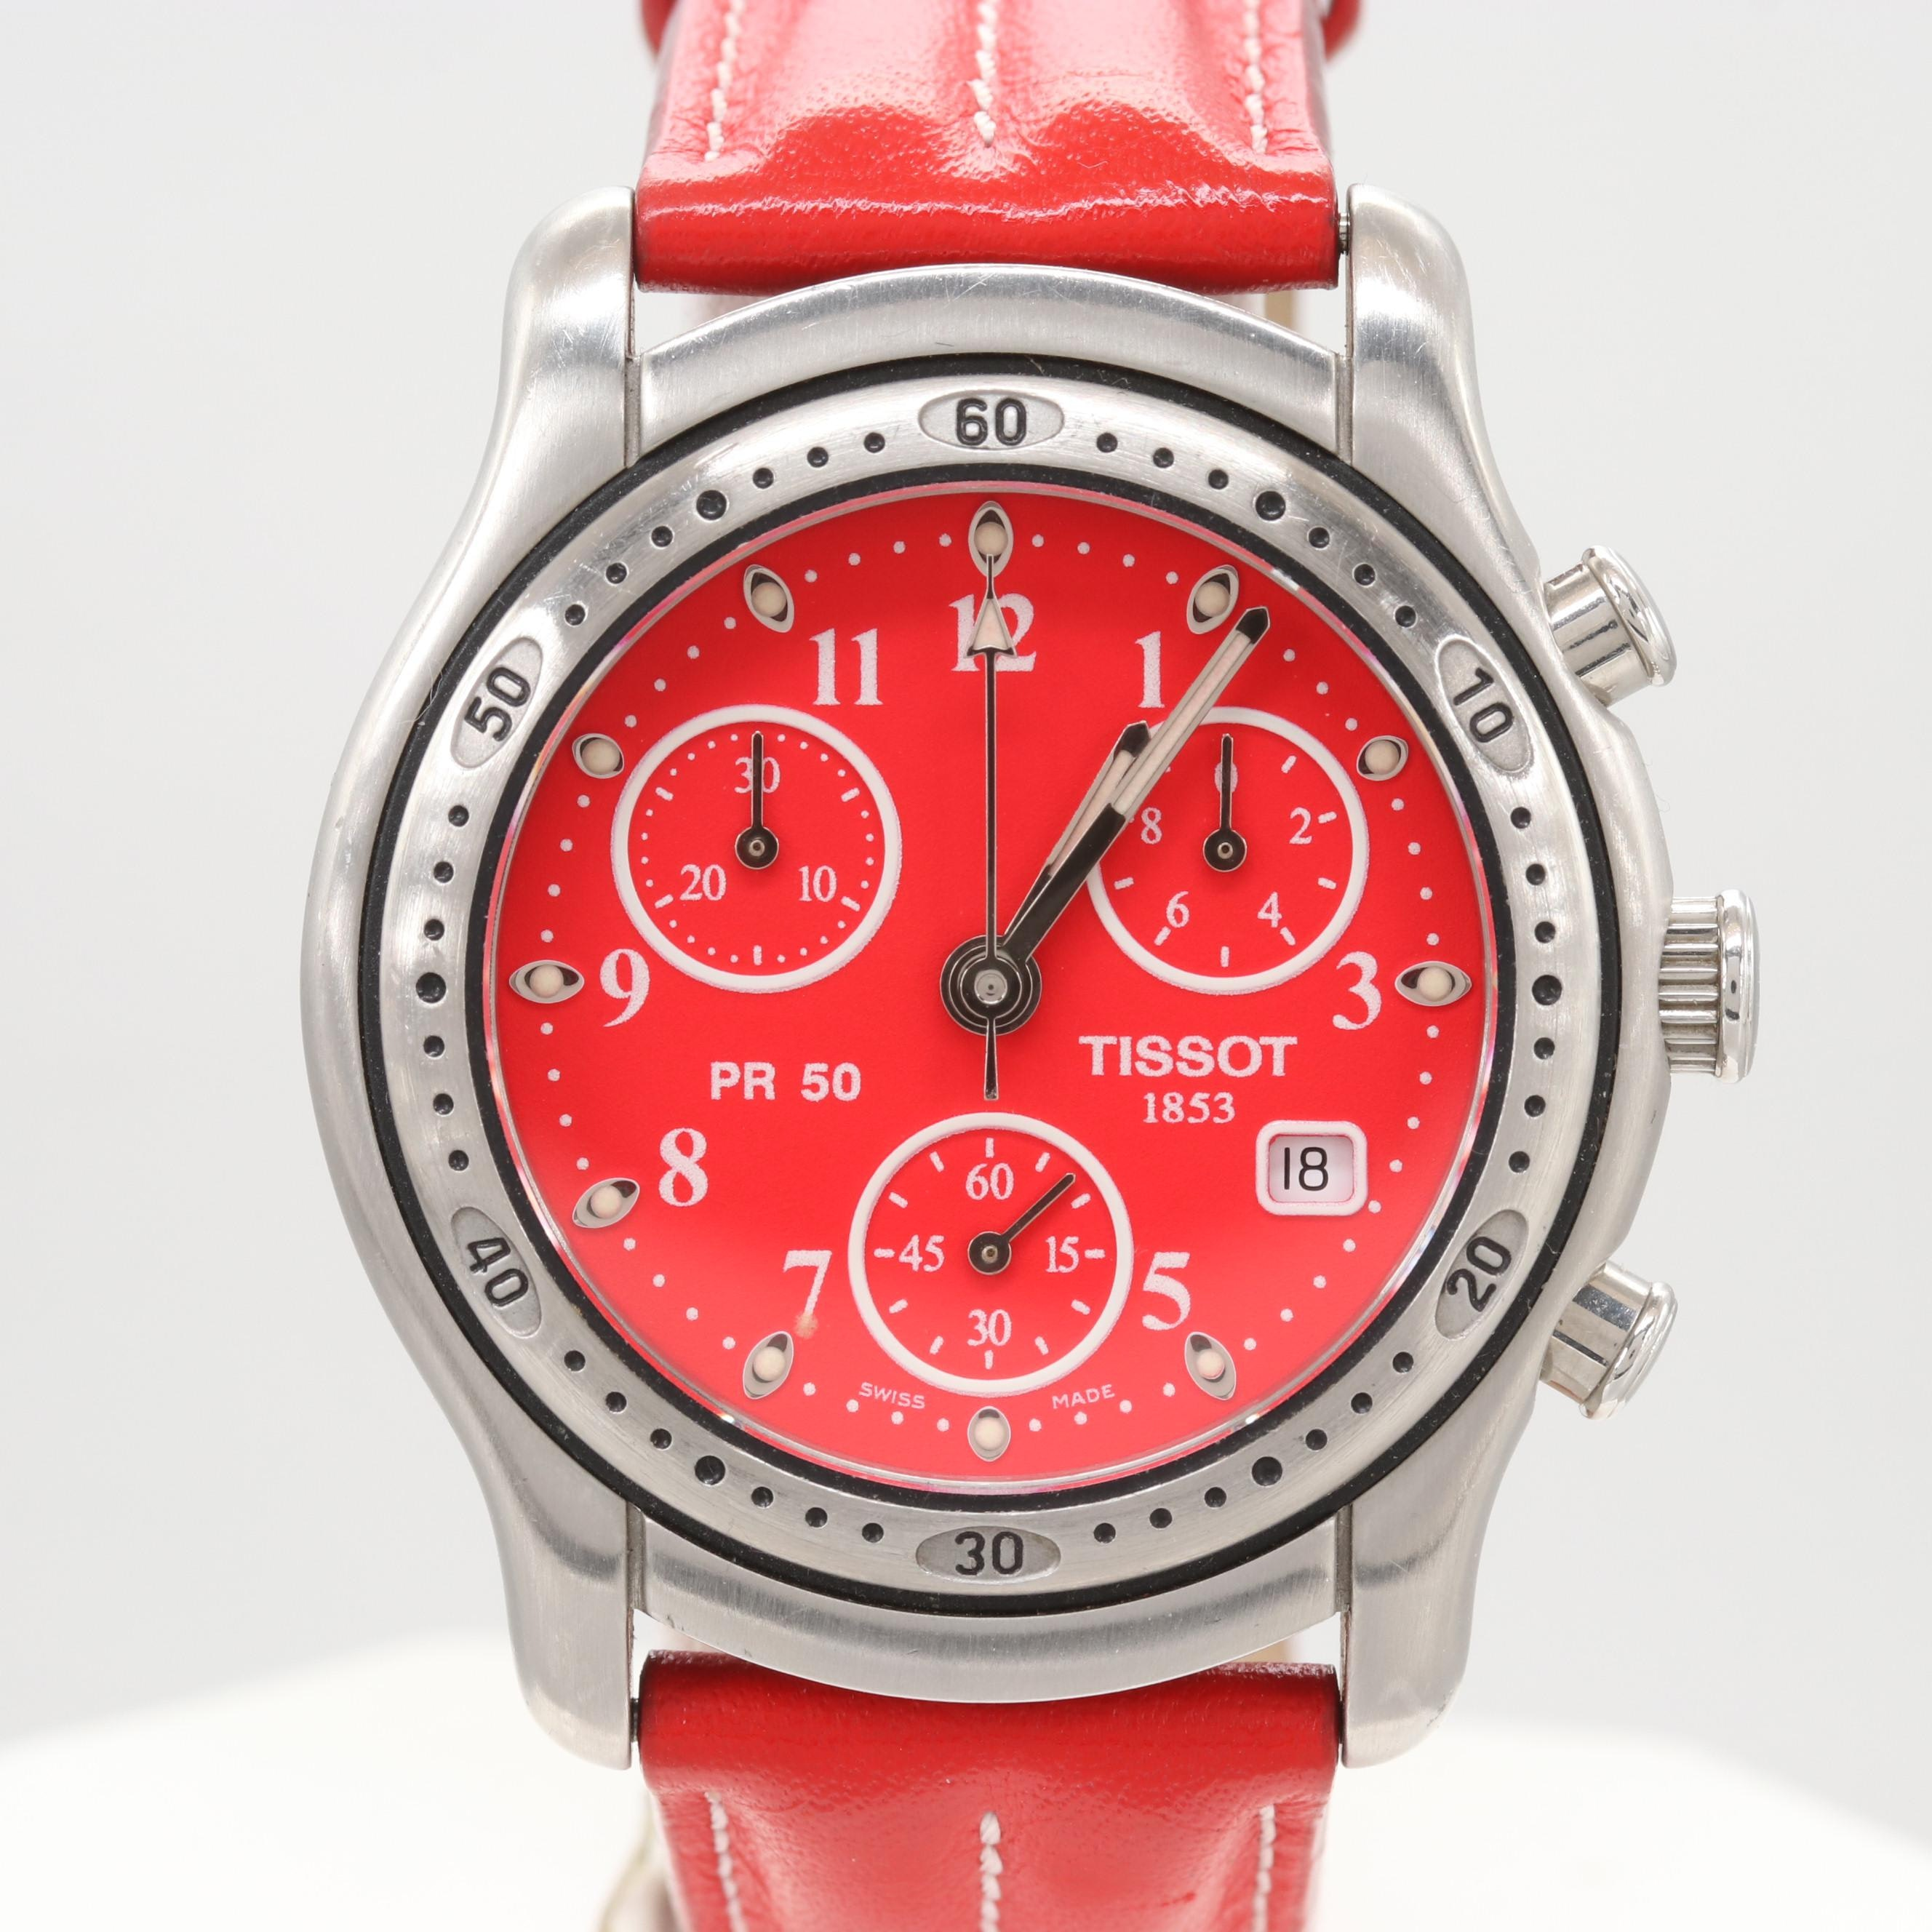 Tissot PR50 Quartz Chronograph Wristwatch